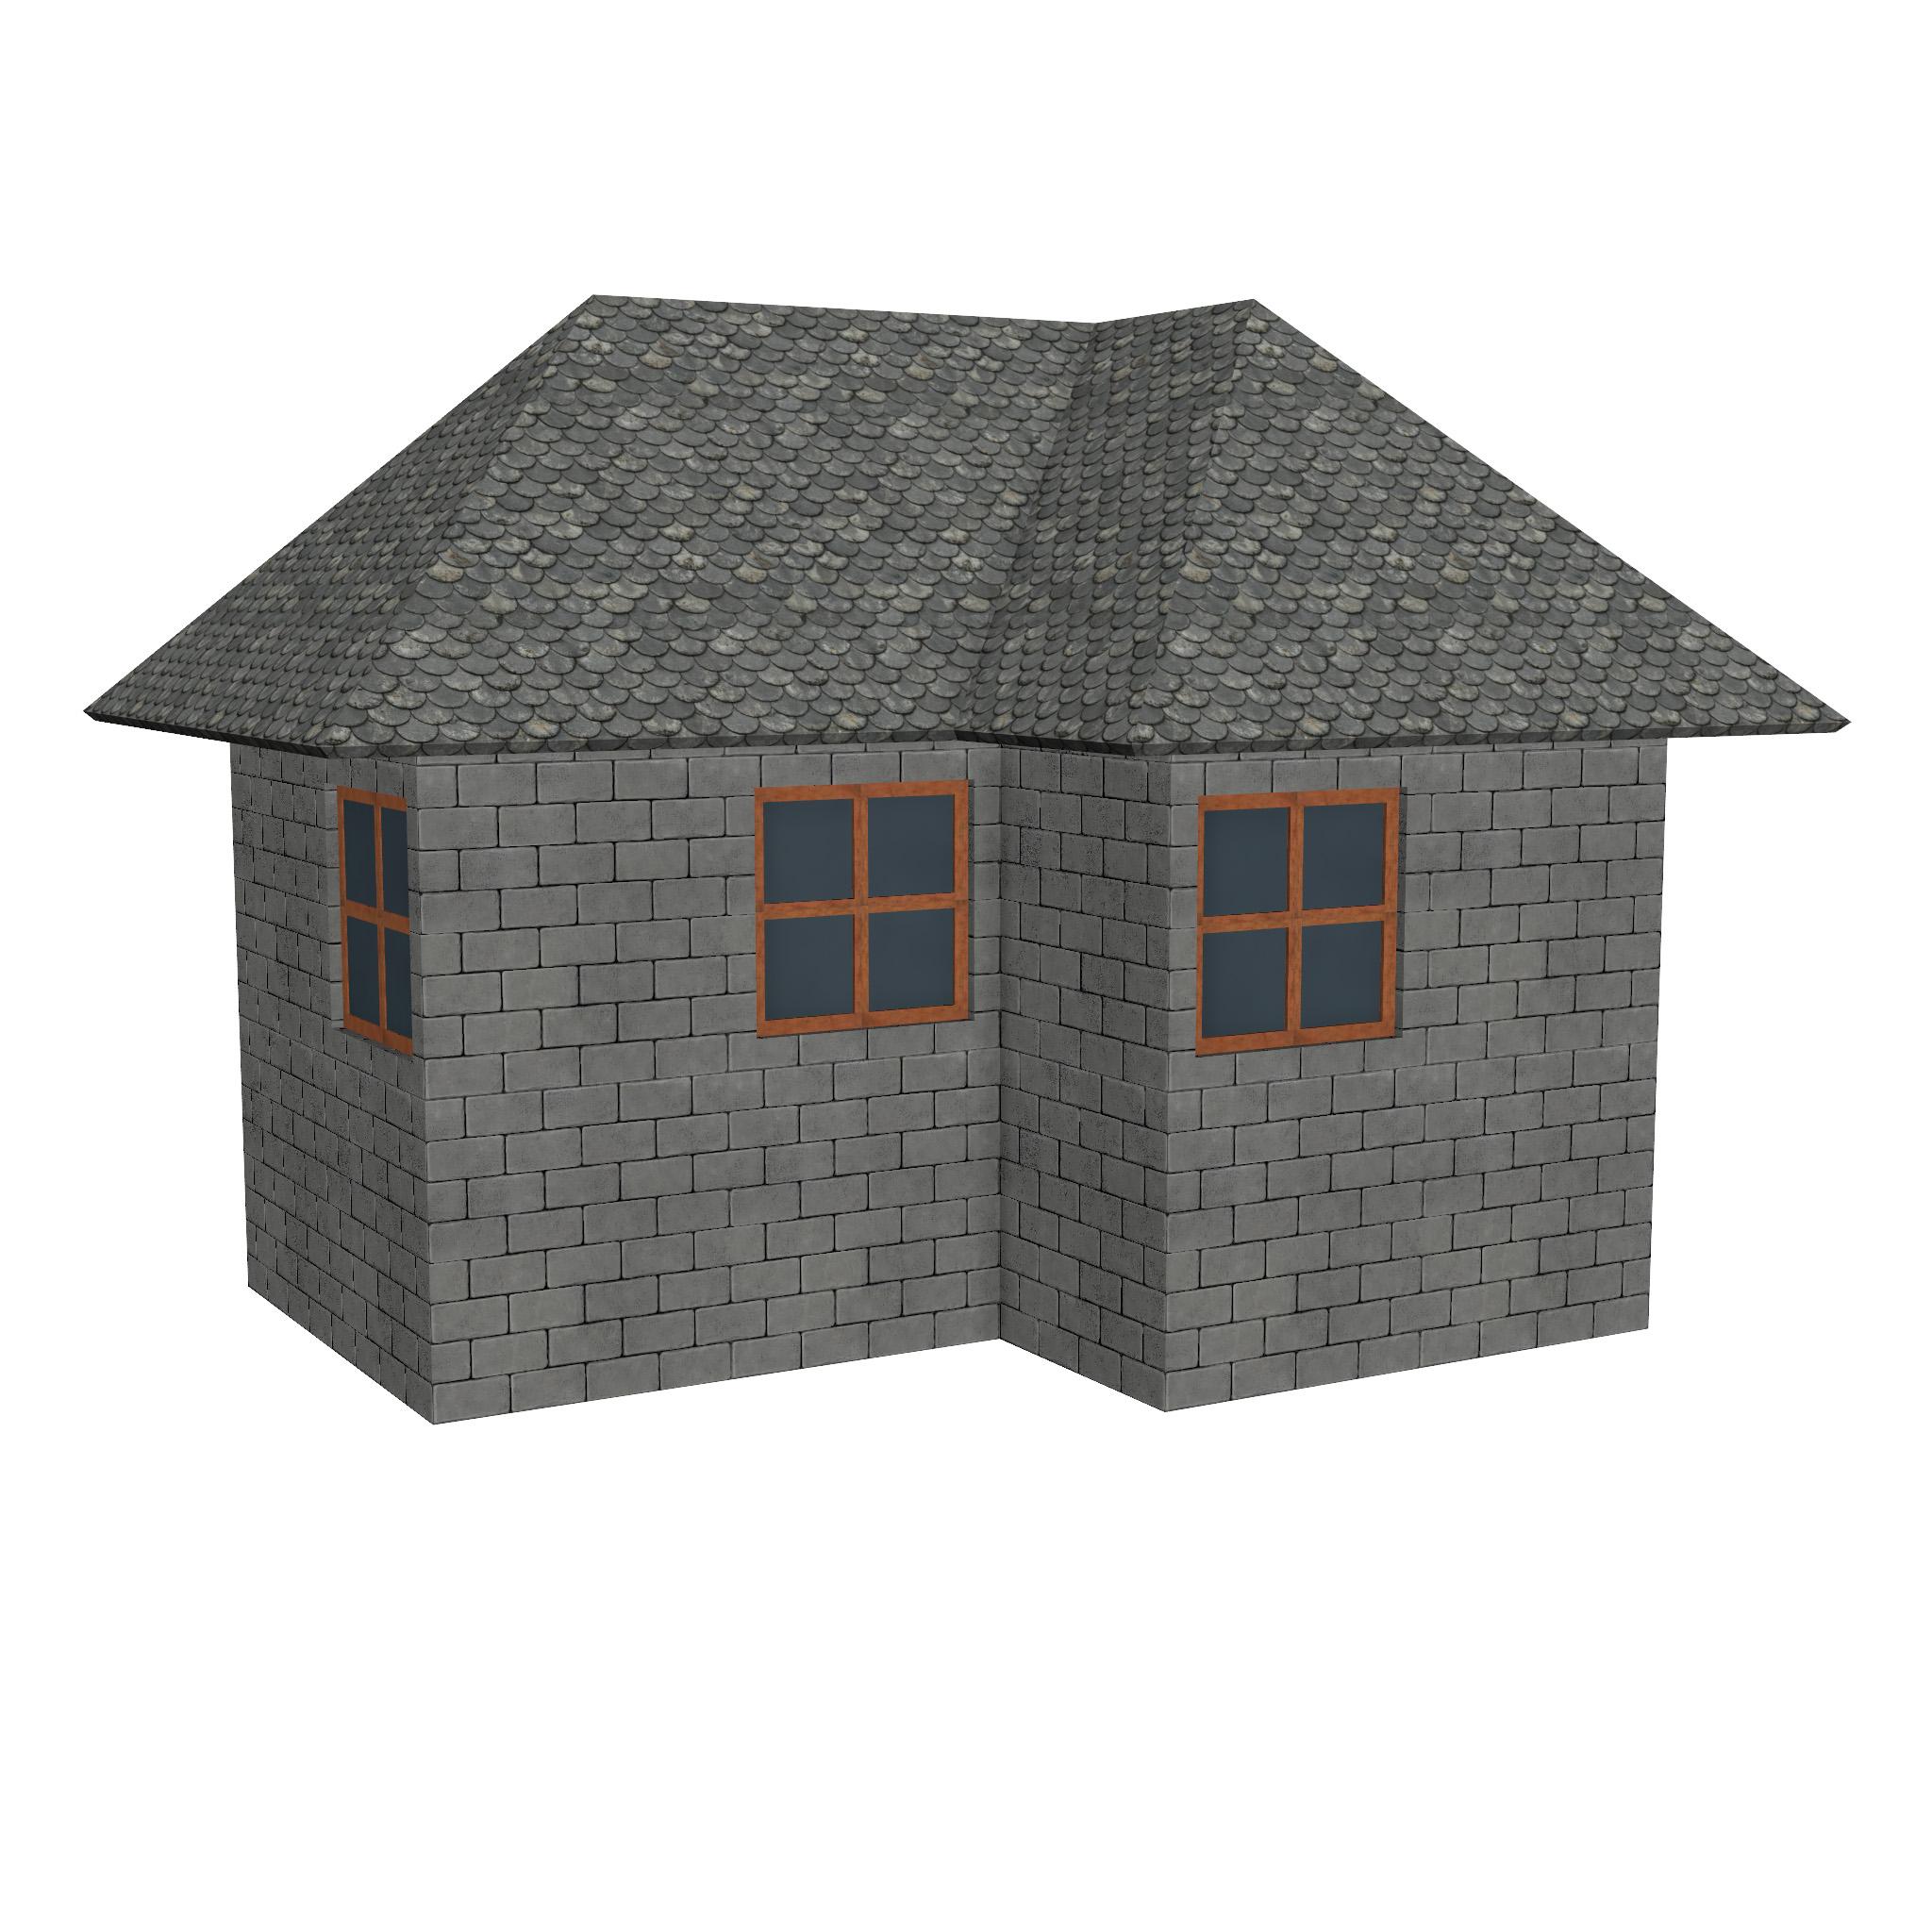 modular brick house set 3d model fbx ma mb 271412